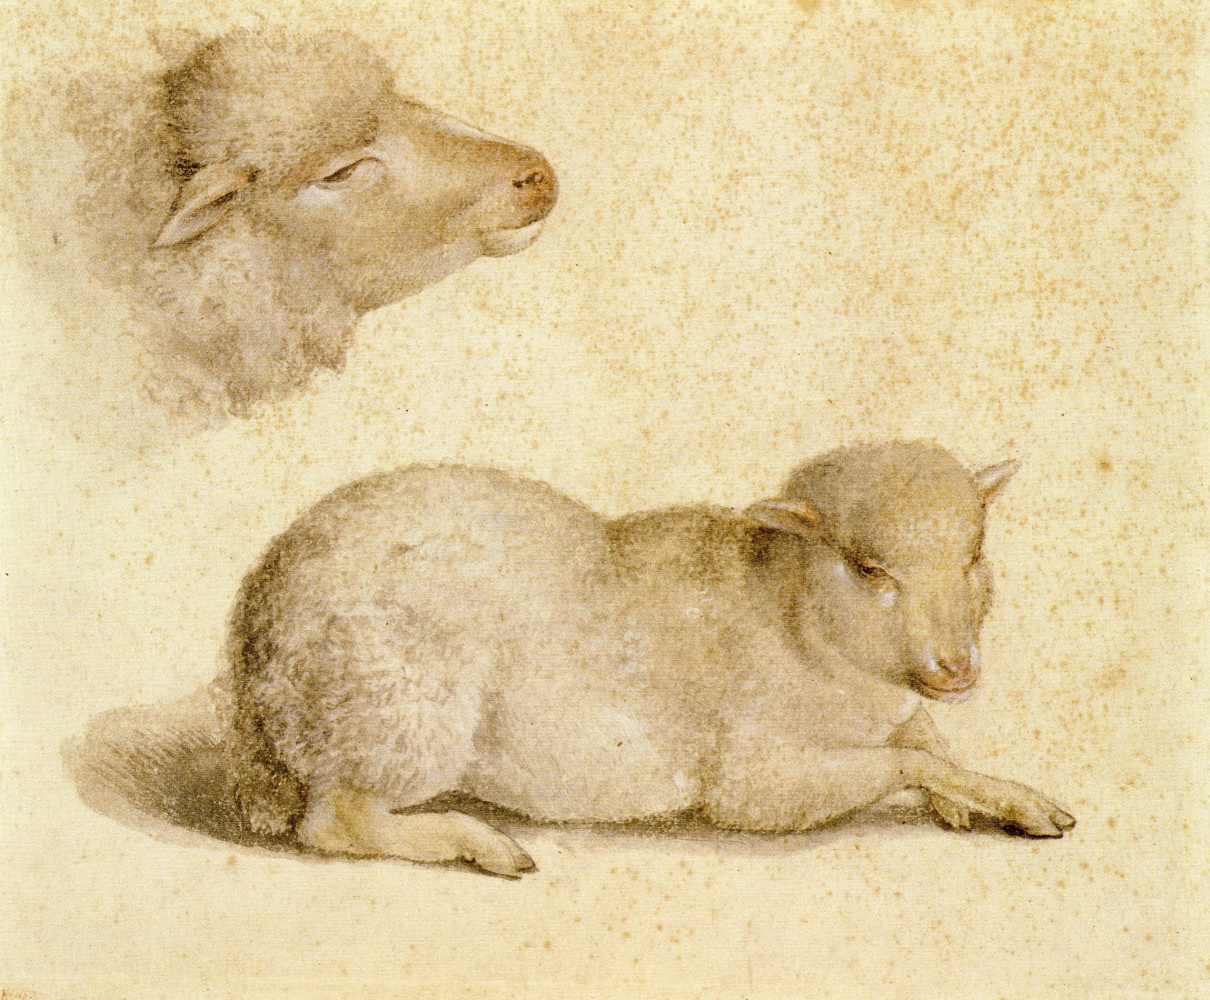 Ганс Гольбейн Младший. Отдыхающий ягненок и голова ягненка